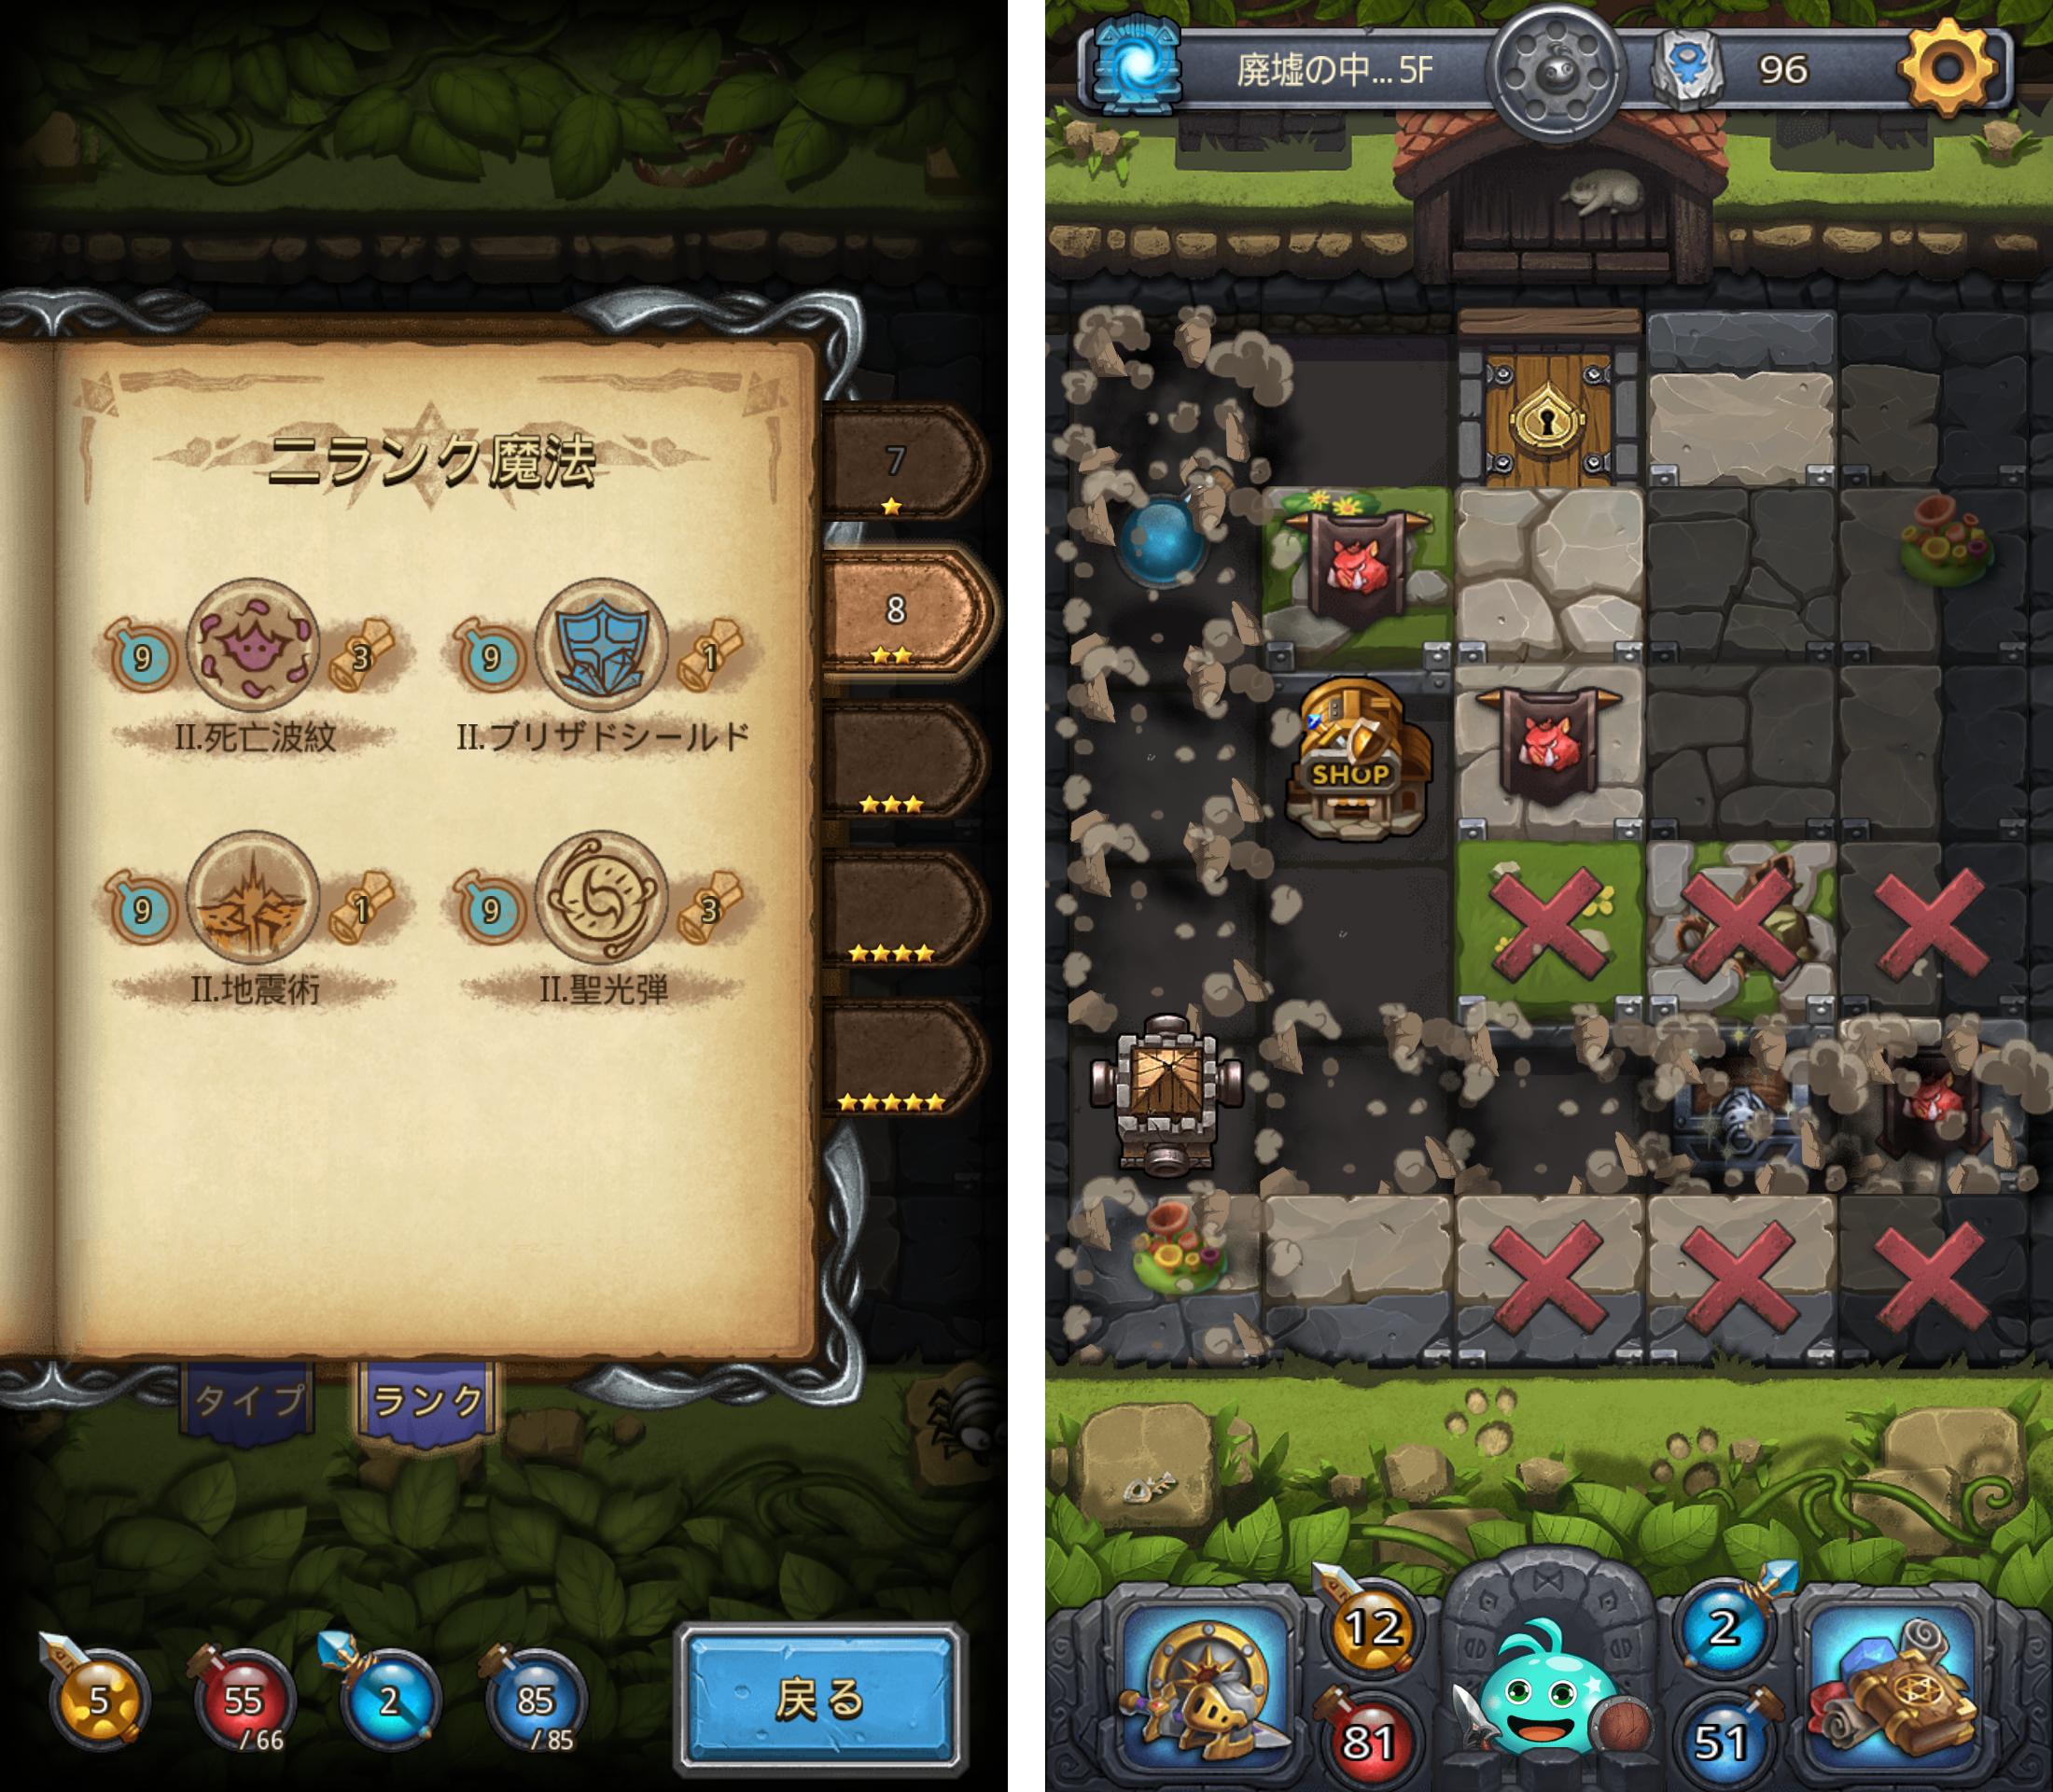 androidアプリ ダンジョンズ&ガンボル(Gumballs & Dungeons)攻略スクリーンショット4